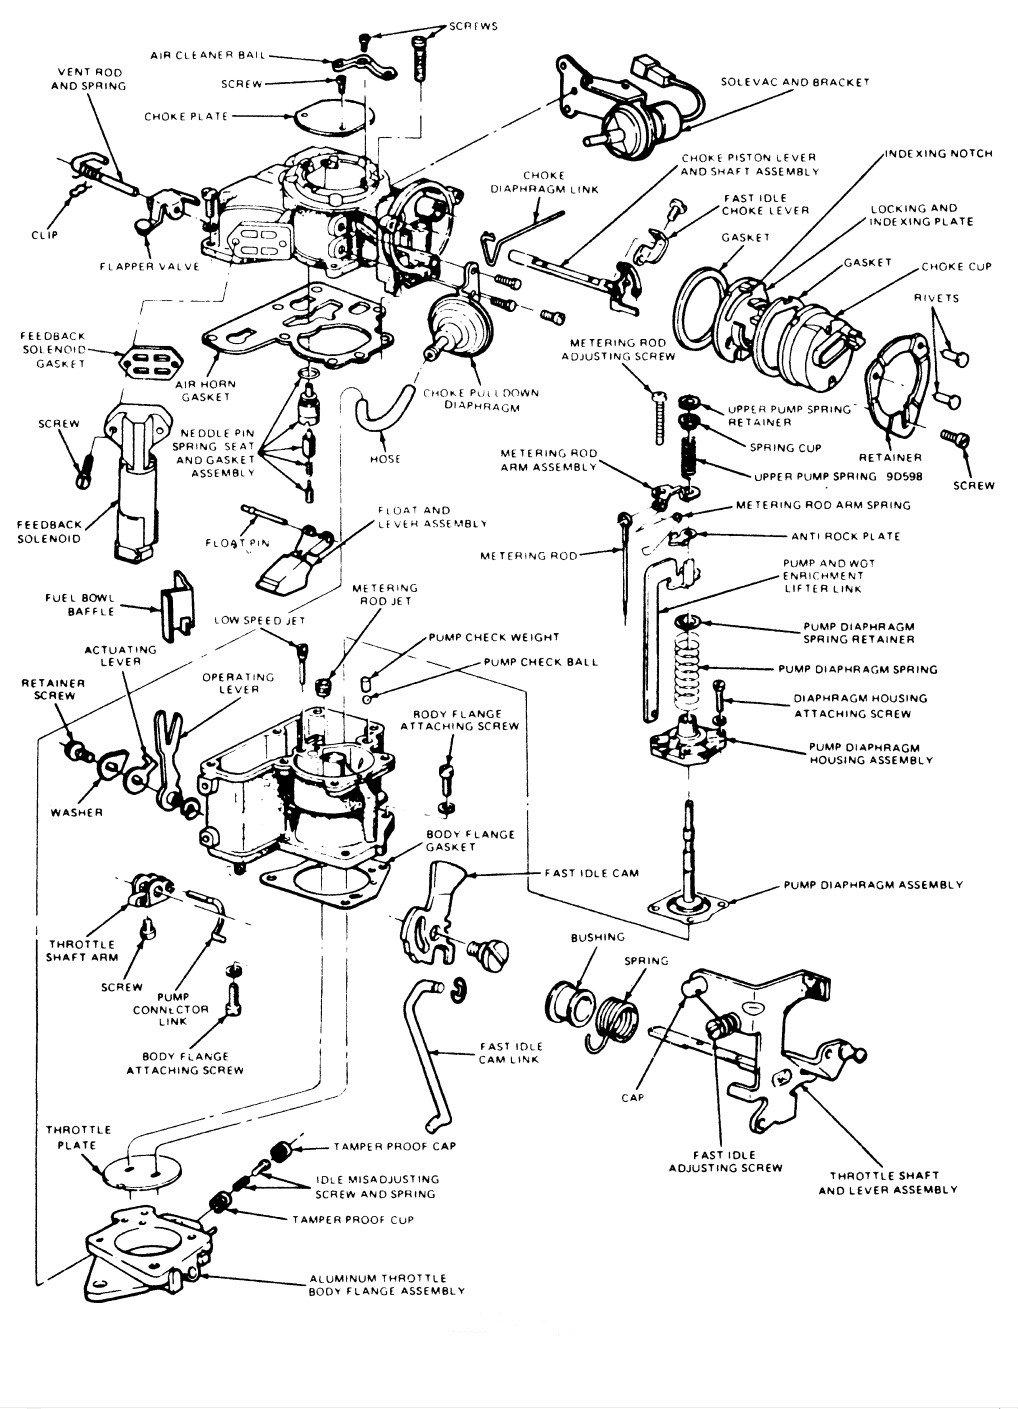 1998 Ford Windstar Exhaust System Diagram Trusted Schematics Wiring 98 Ranger Schematic Diagrams 2001 Parts 1984 Carburetor